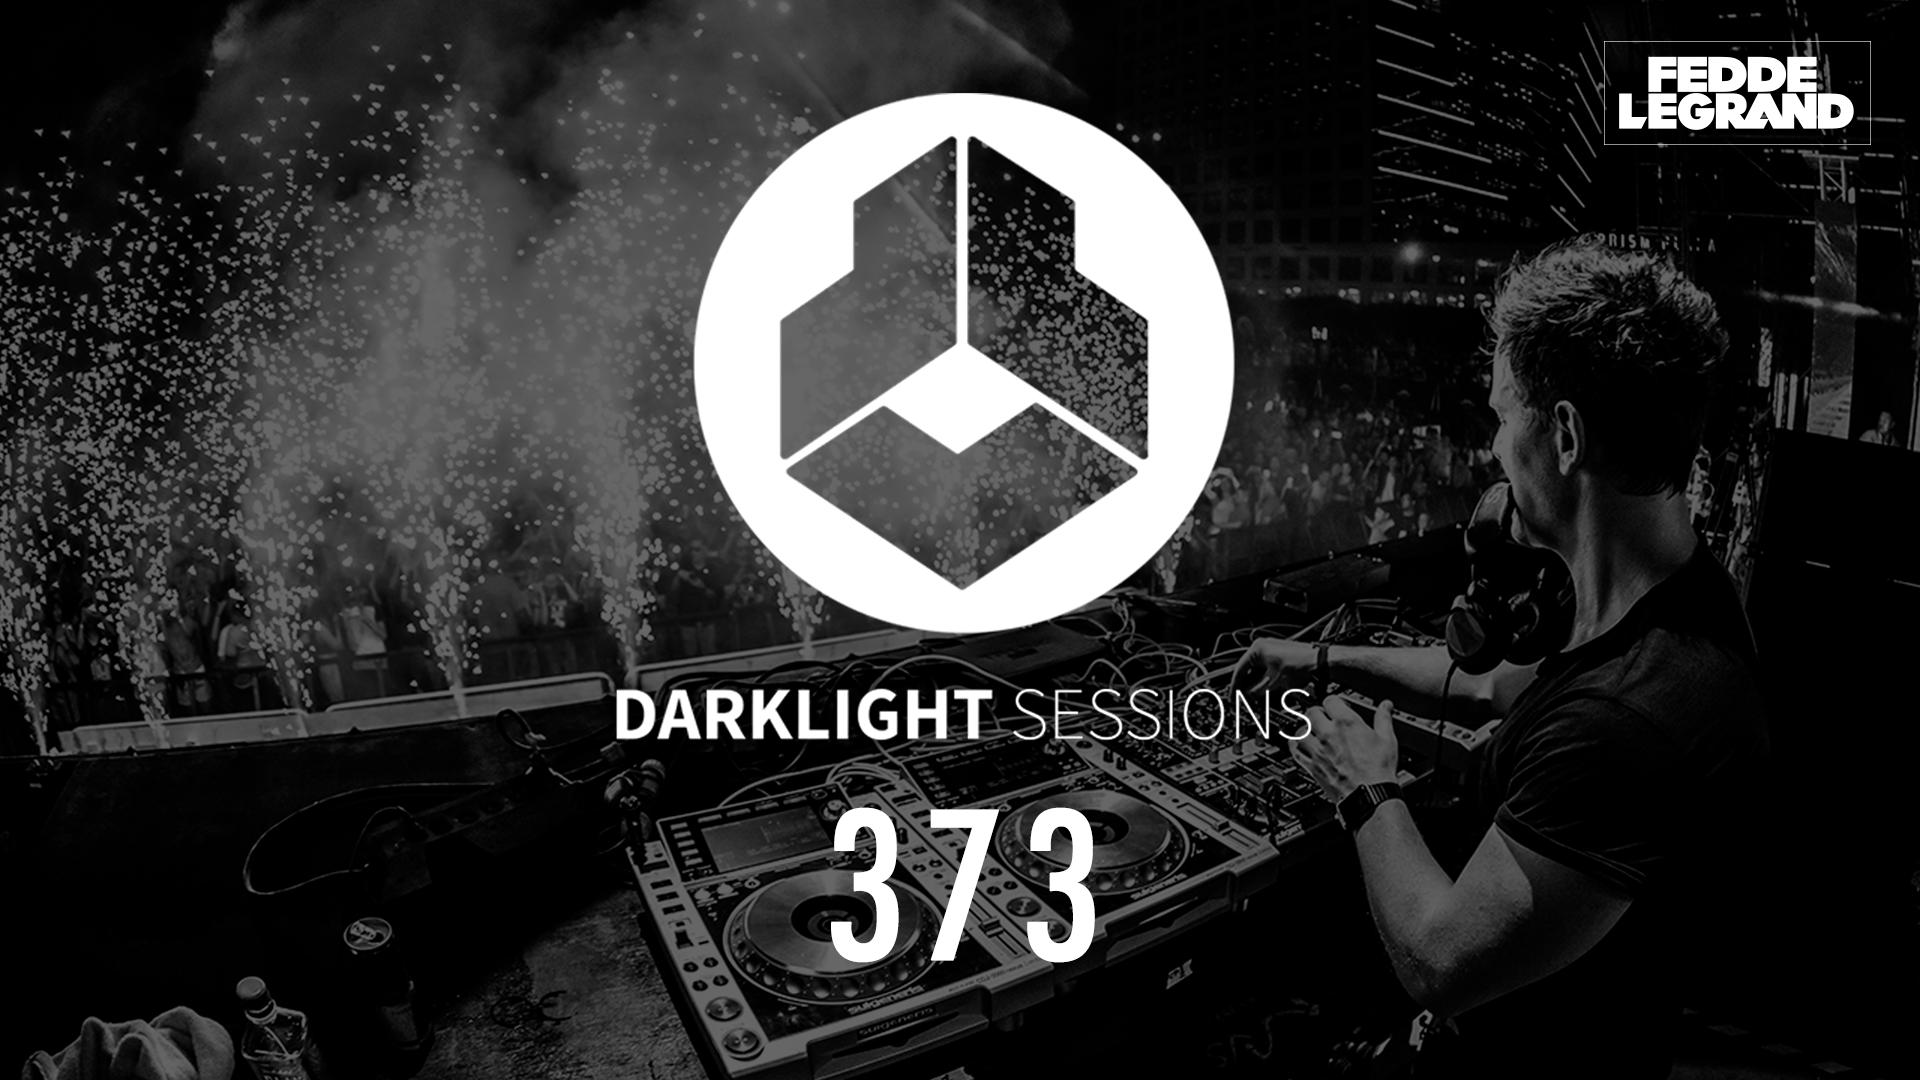 Darklight Sessions 373